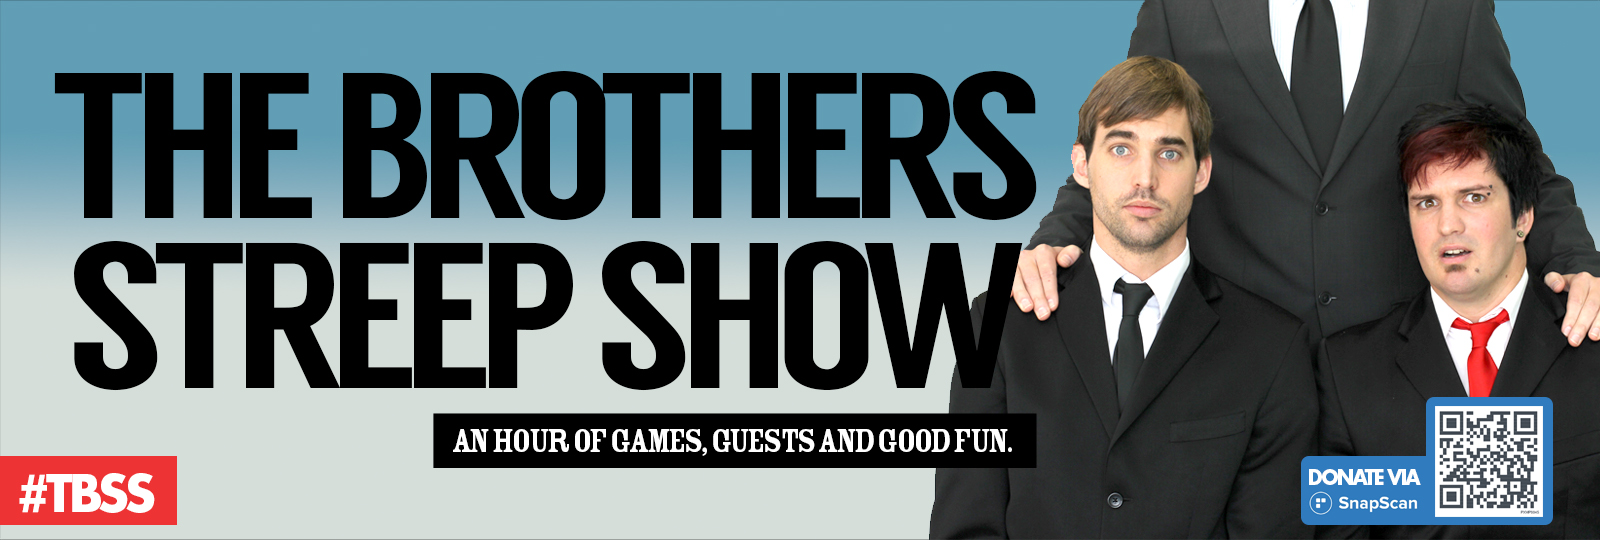 BrothersStreepShowWebsiteBanner